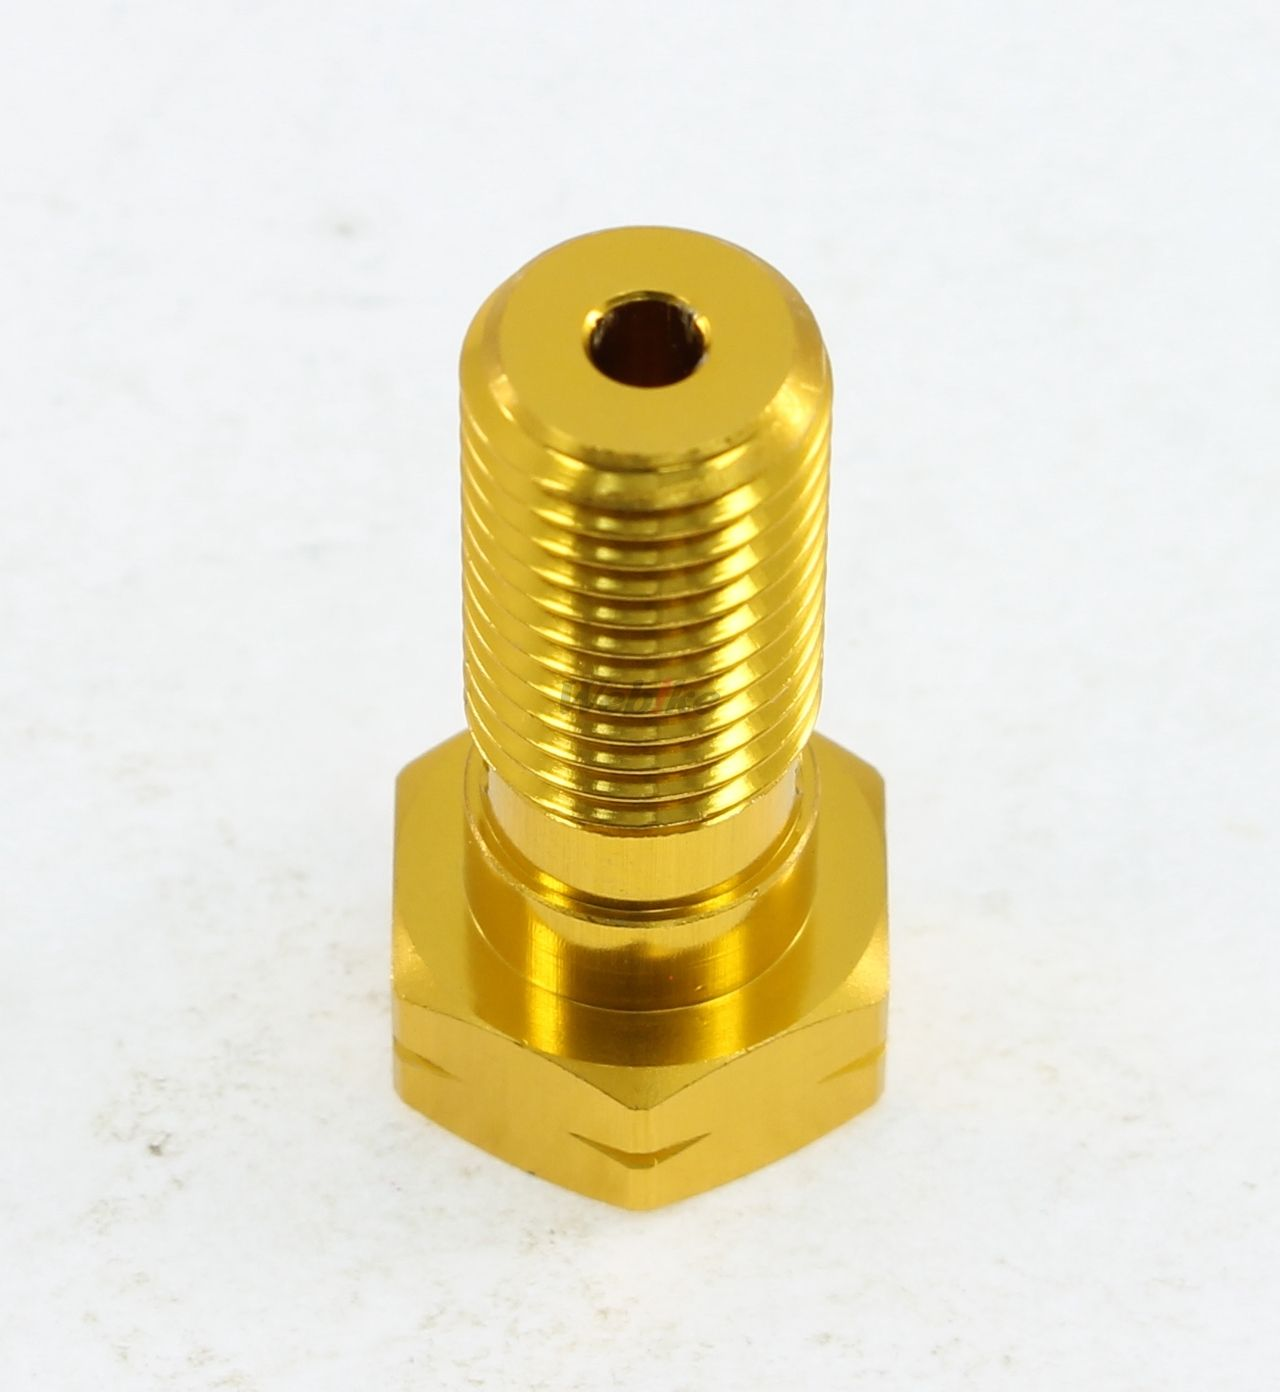 【KITACO】鋁合金空心螺絲 - 「Webike-摩托百貨」